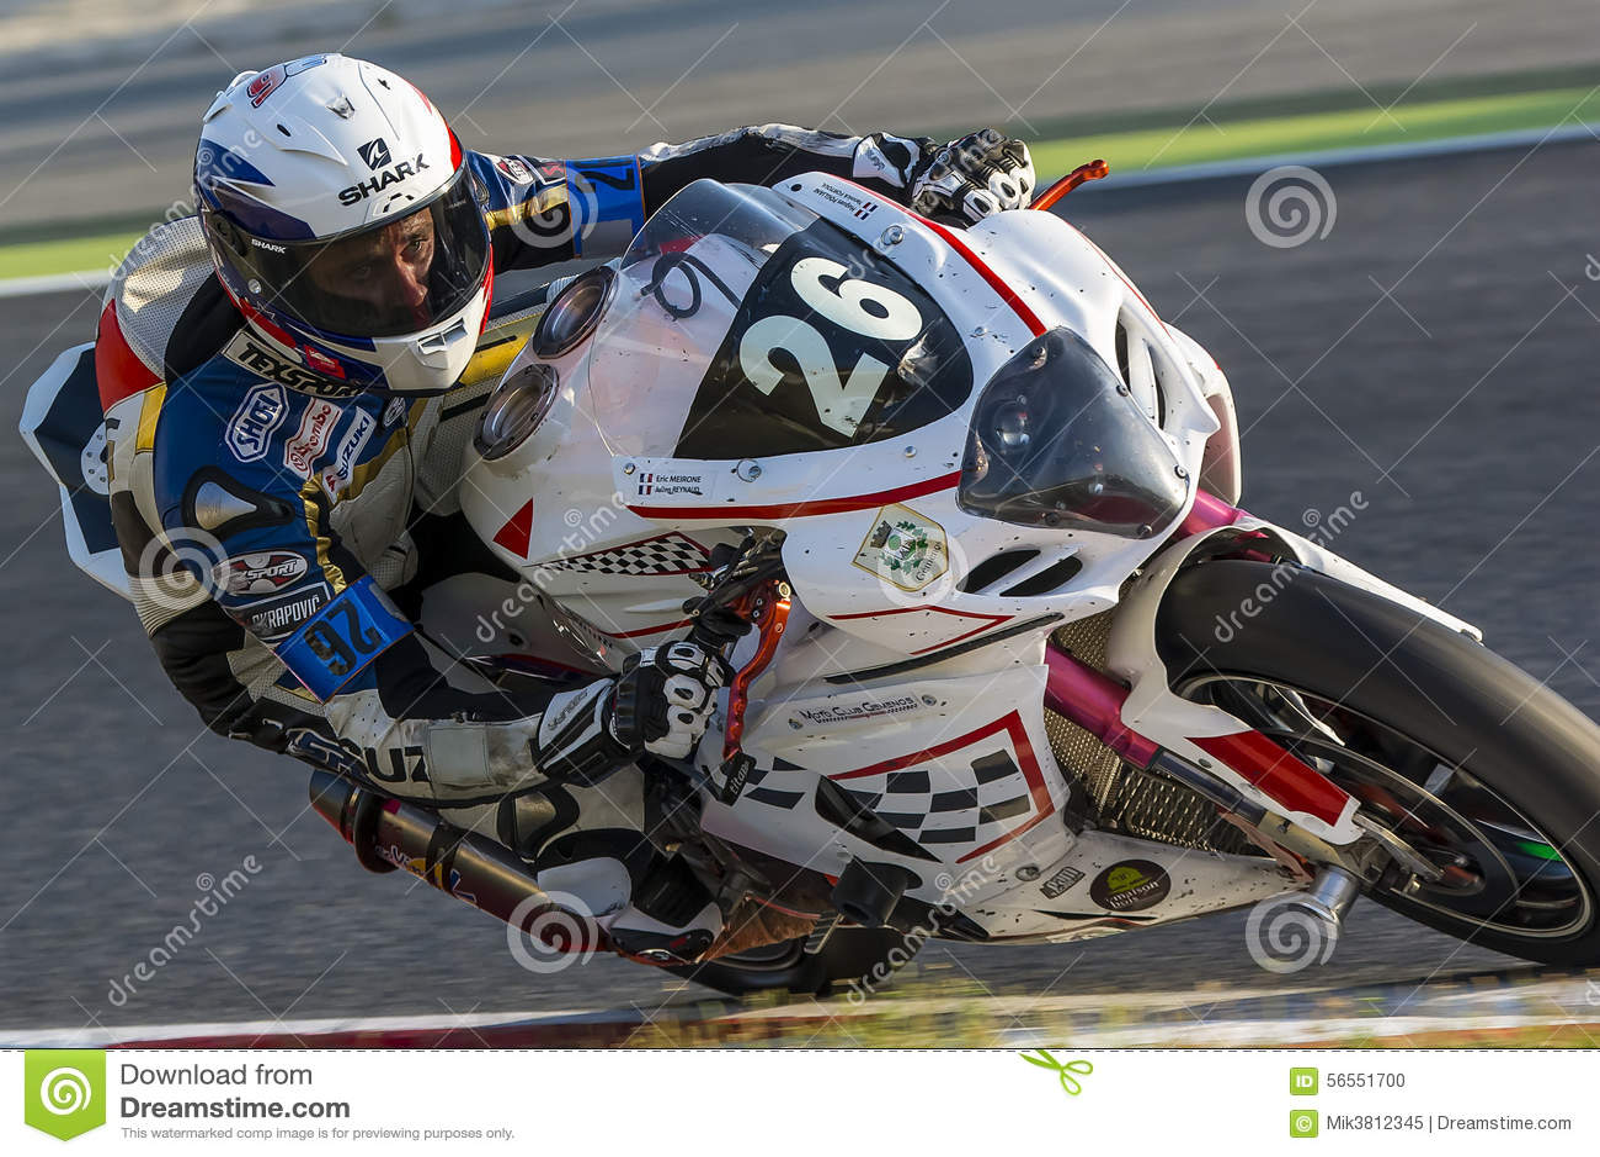 Download Ομάδα Moto Club De Gemenos Racing Εκδοτική εικόνα - εικόνα από ταχύτητα, ανταγωνισμός: 56551700